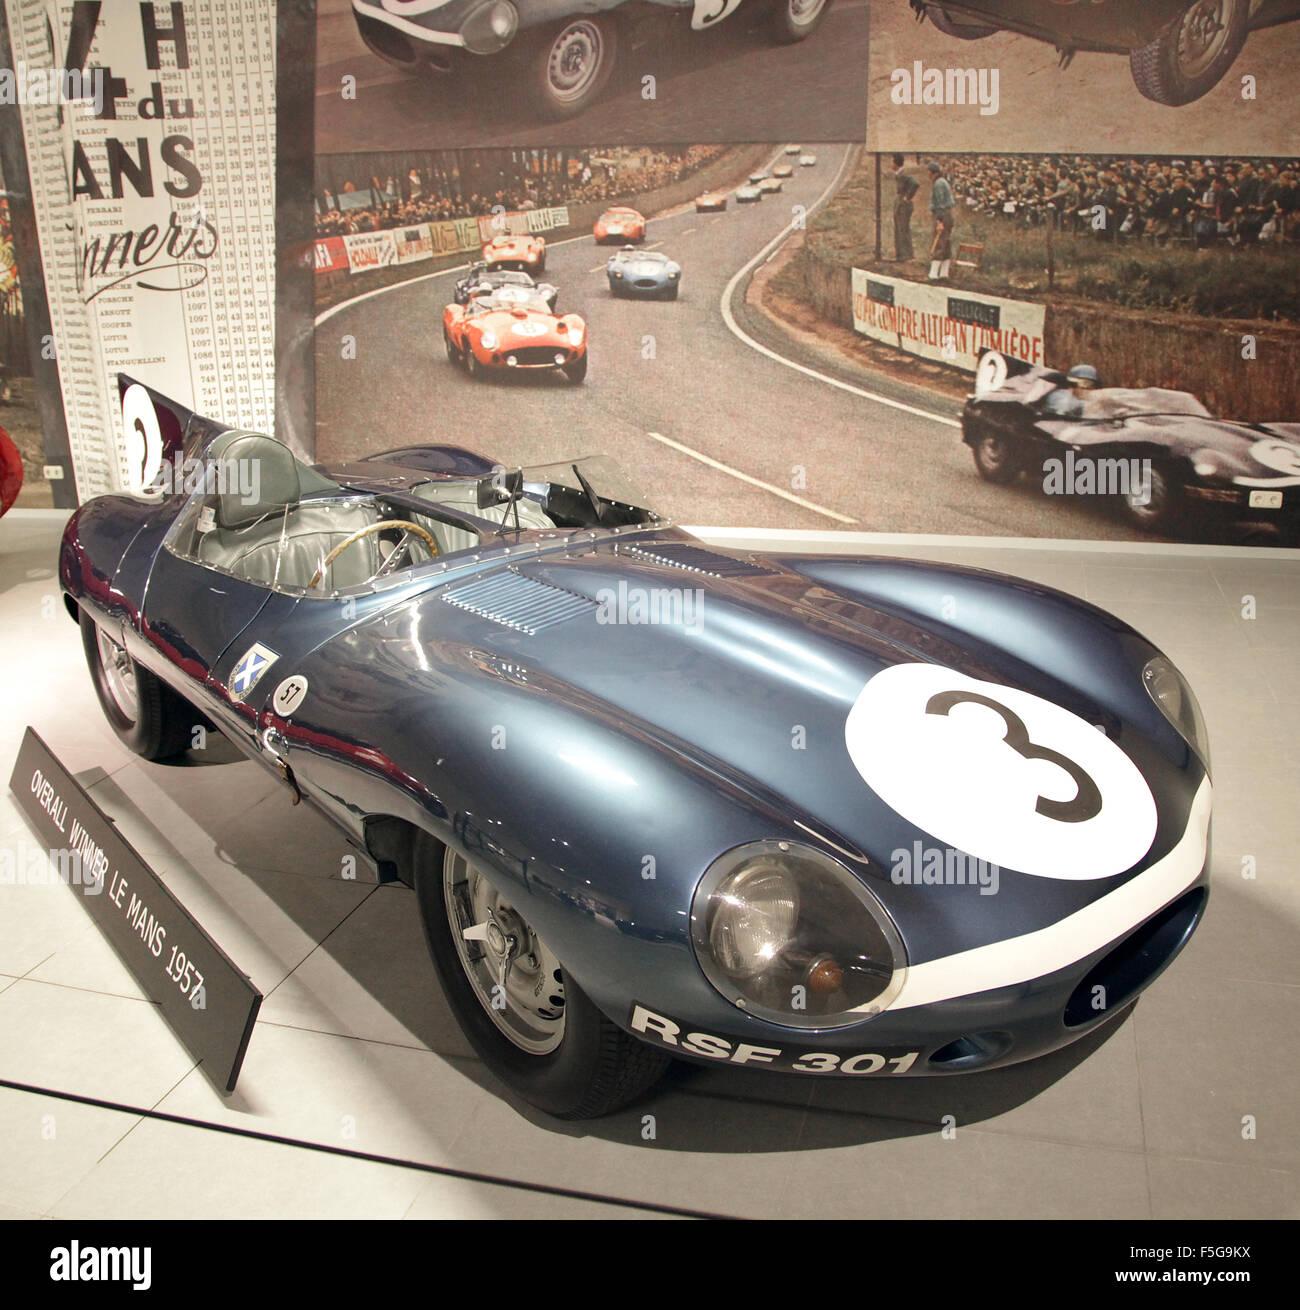 vintage veteran car jaguar d type xkd 606 le mans stock photo royalty free. Black Bedroom Furniture Sets. Home Design Ideas